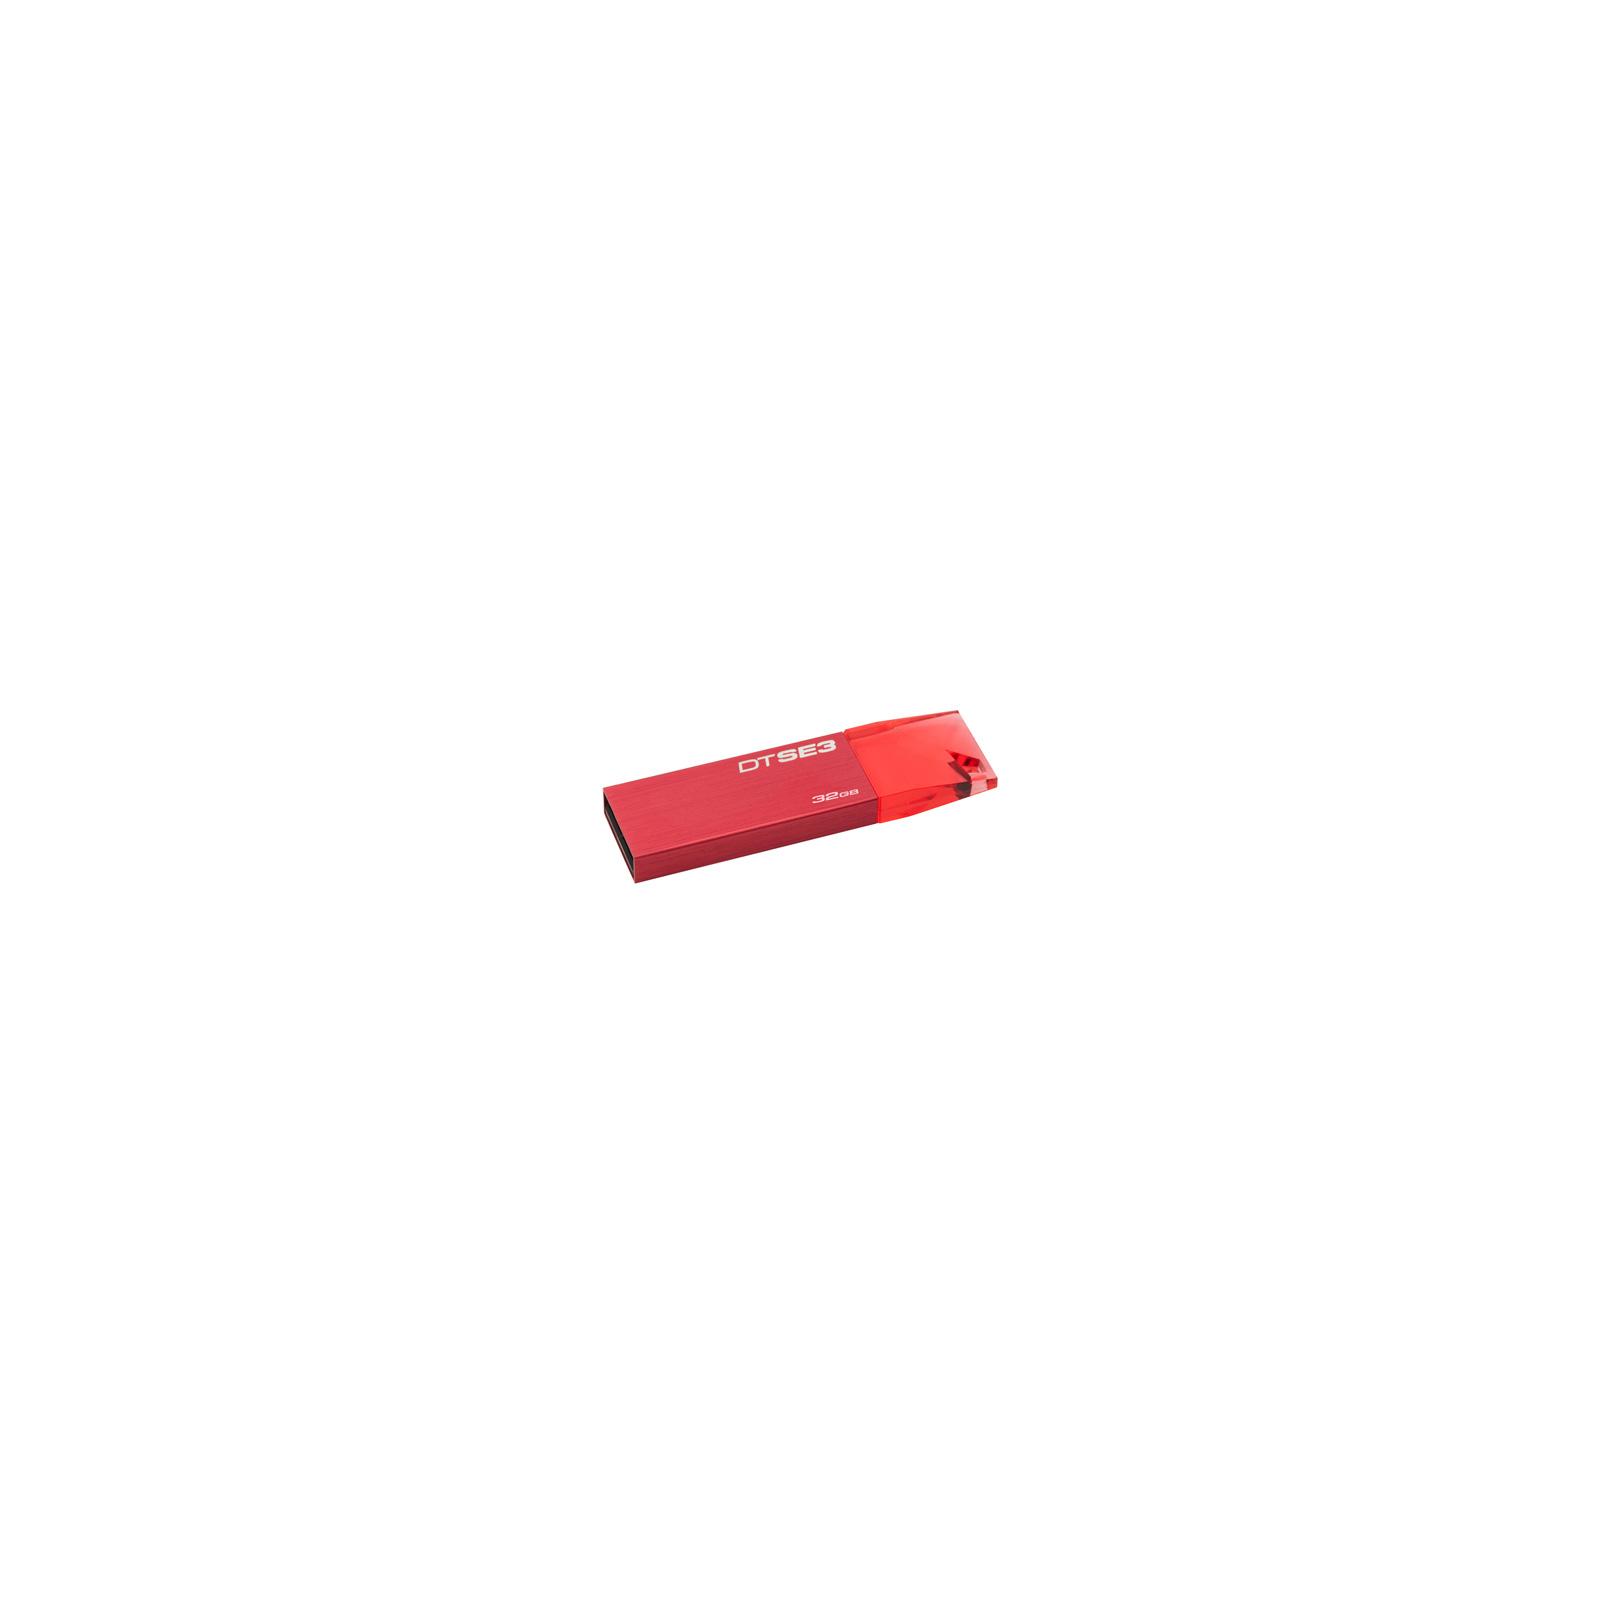 USB флеш накопитель Kingston 32Gb DataTraveler SE3 red (KC-U6832-3YR)